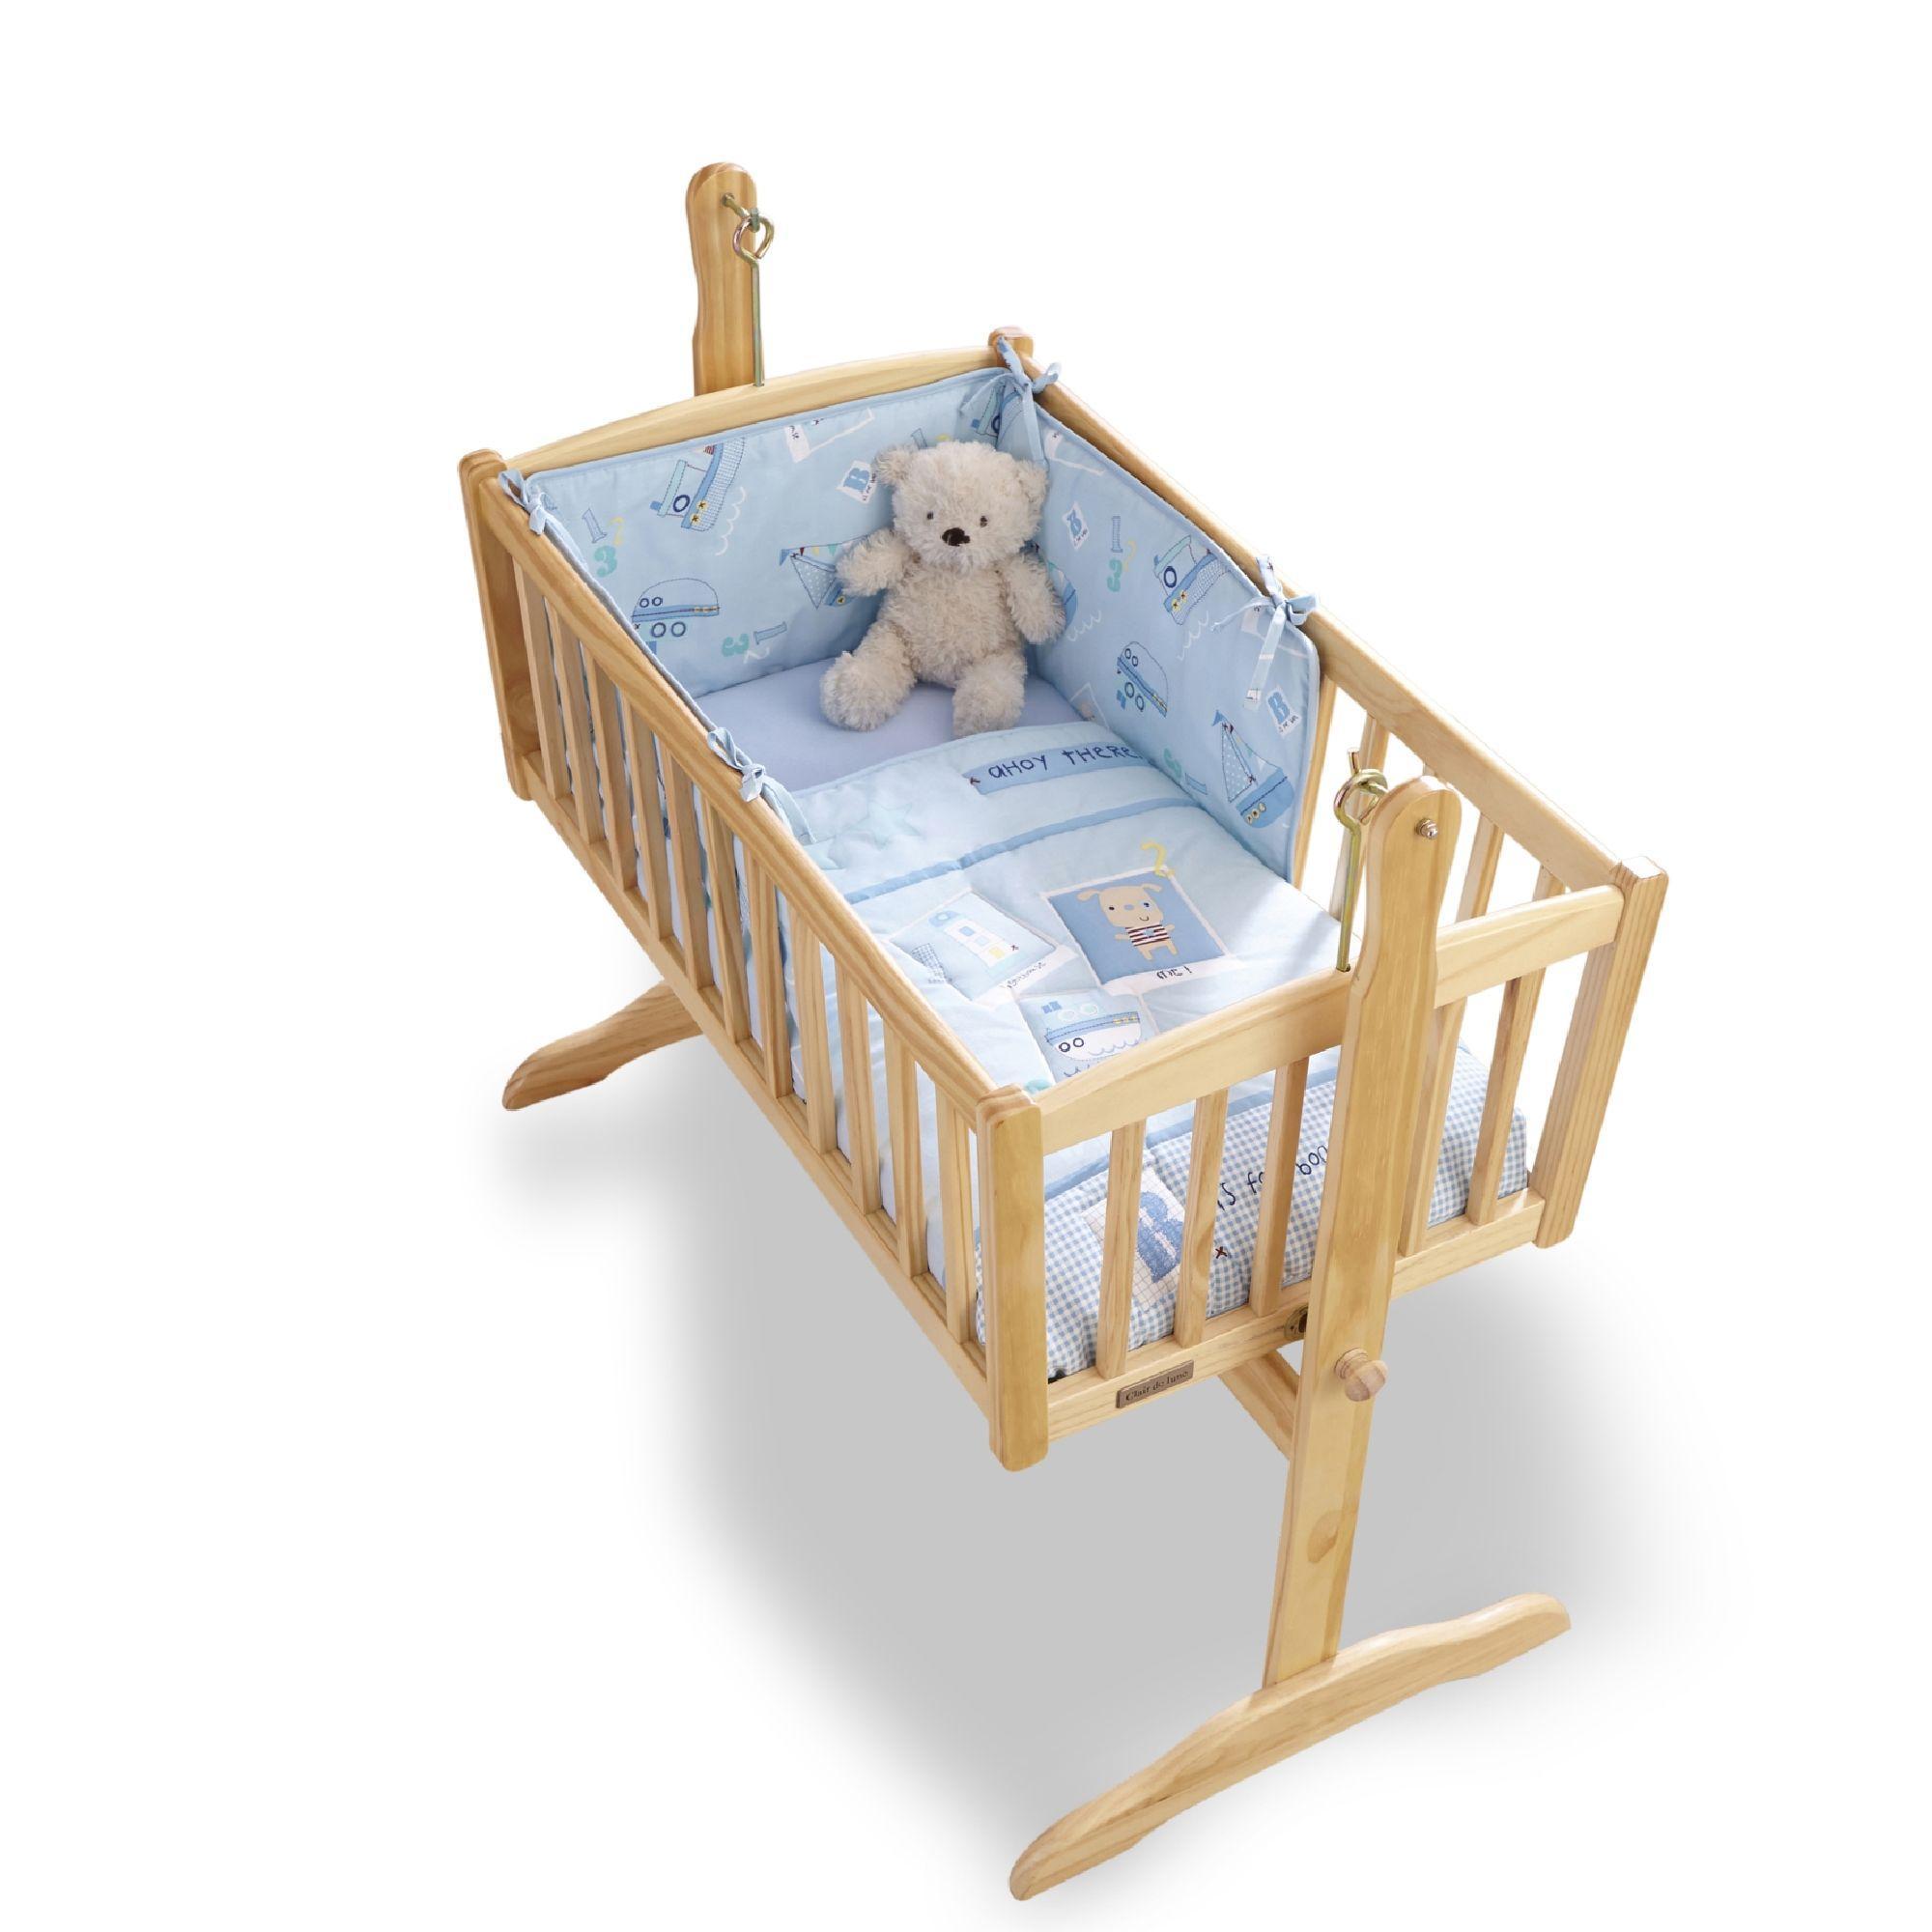 Handmade Moses Basket Bedding : Clair de lune ahoy rocking crib bedding includes quilt and